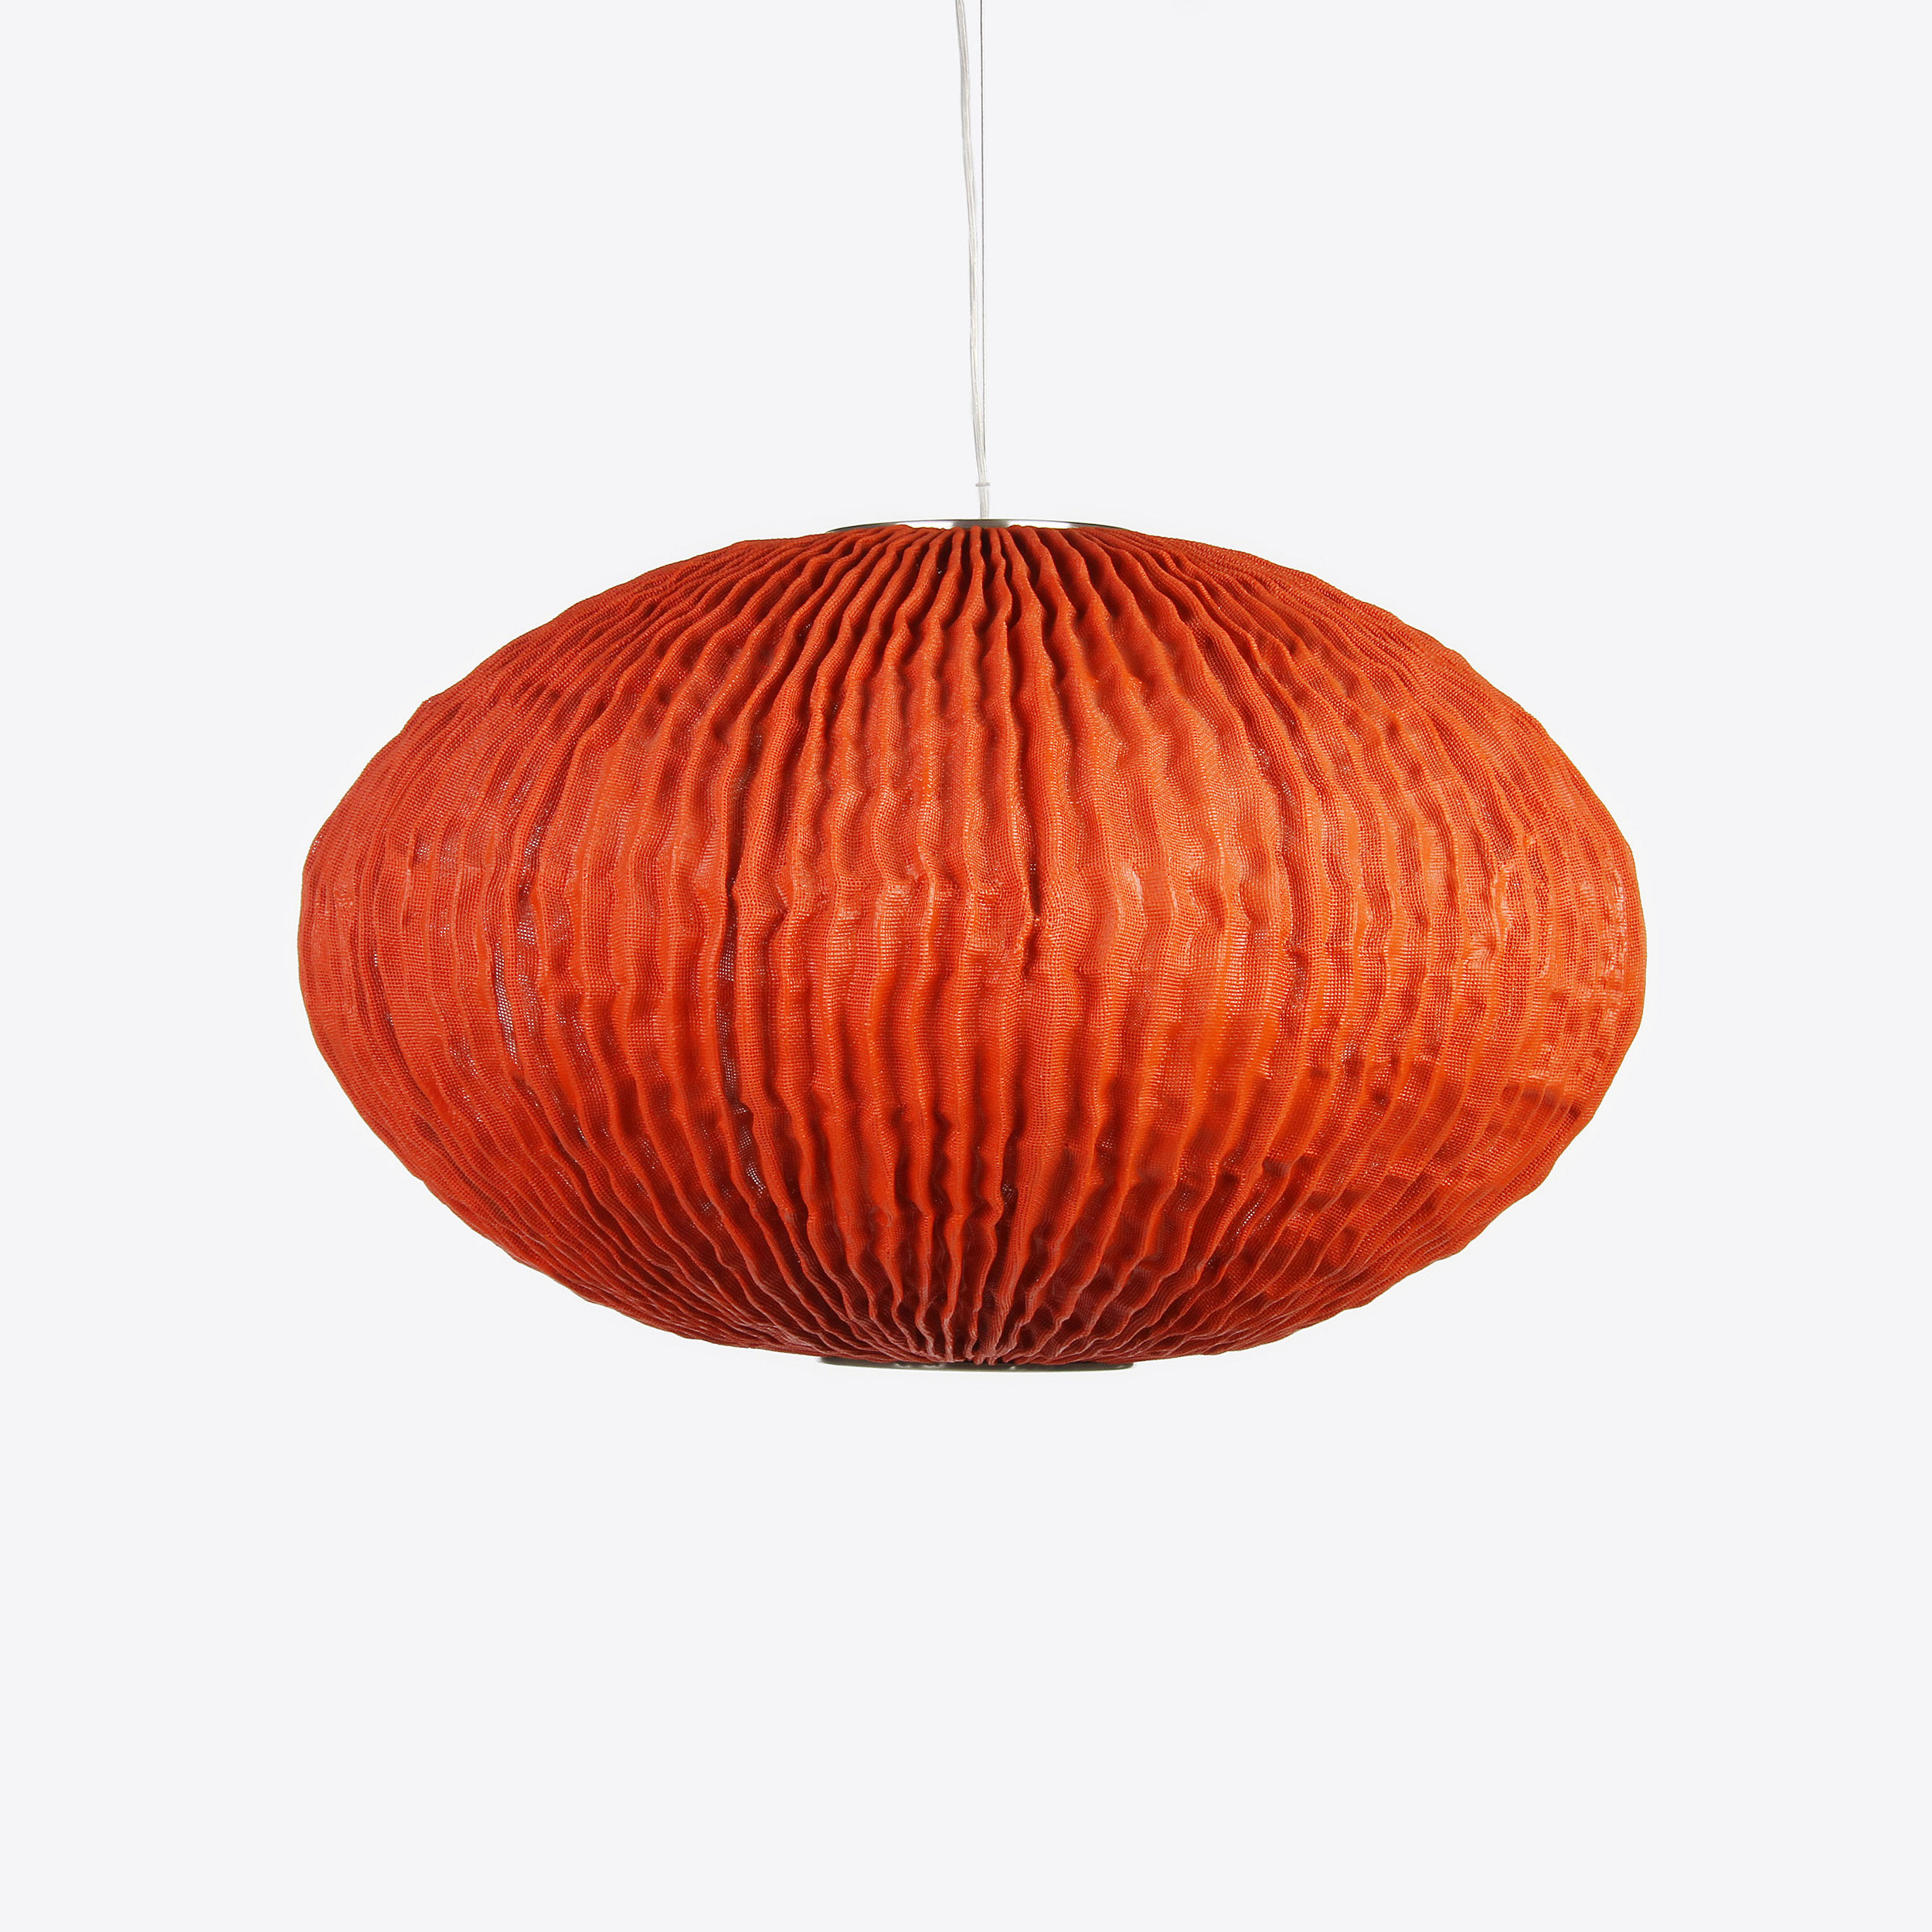 Coral Seaurchin Pendelleuchte - orange